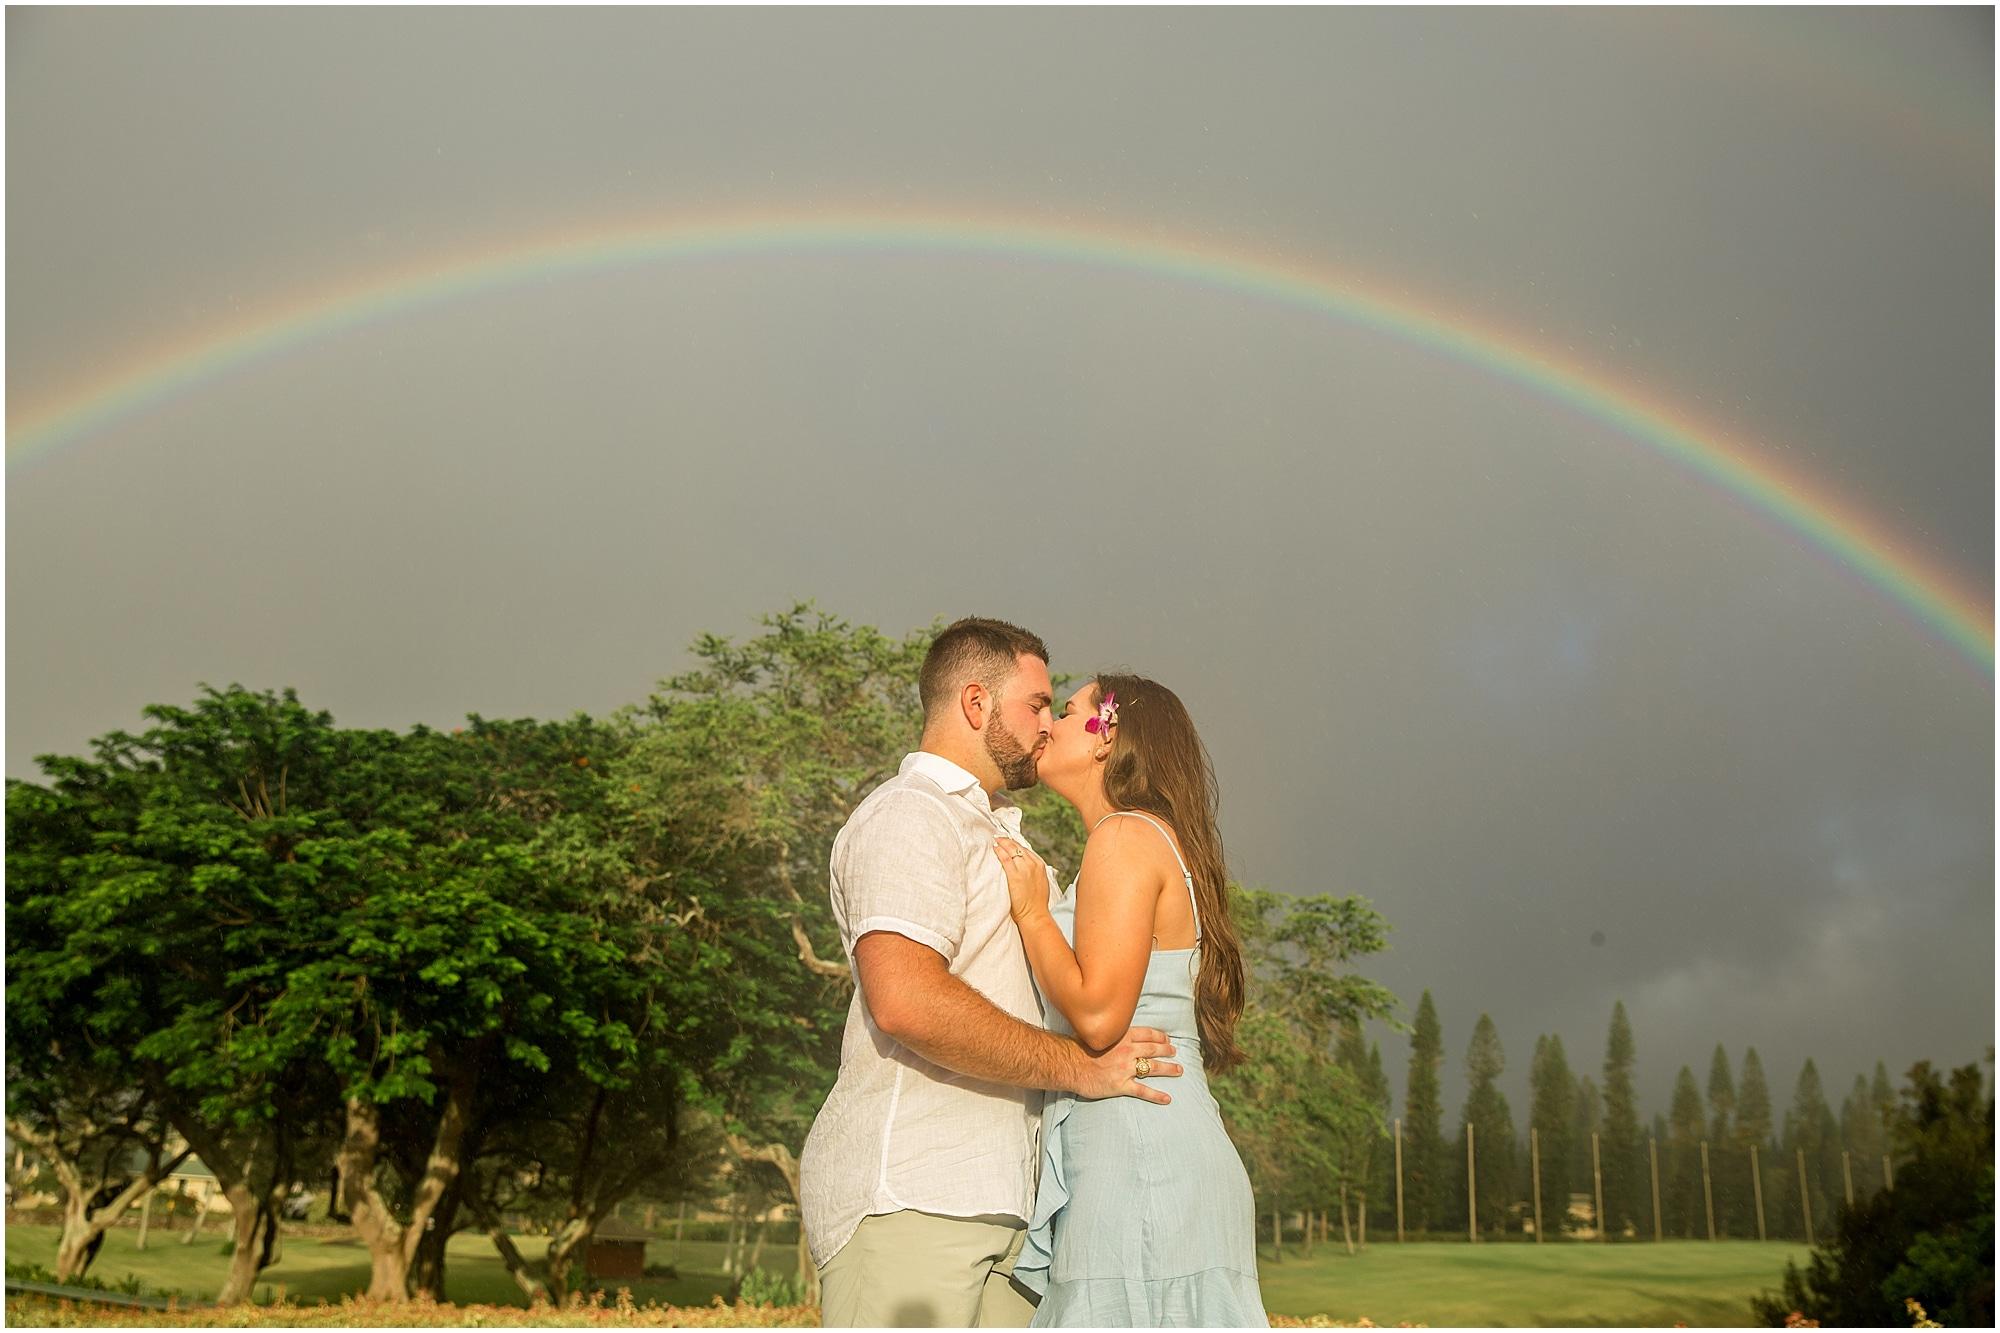 Kissing under a rainbow